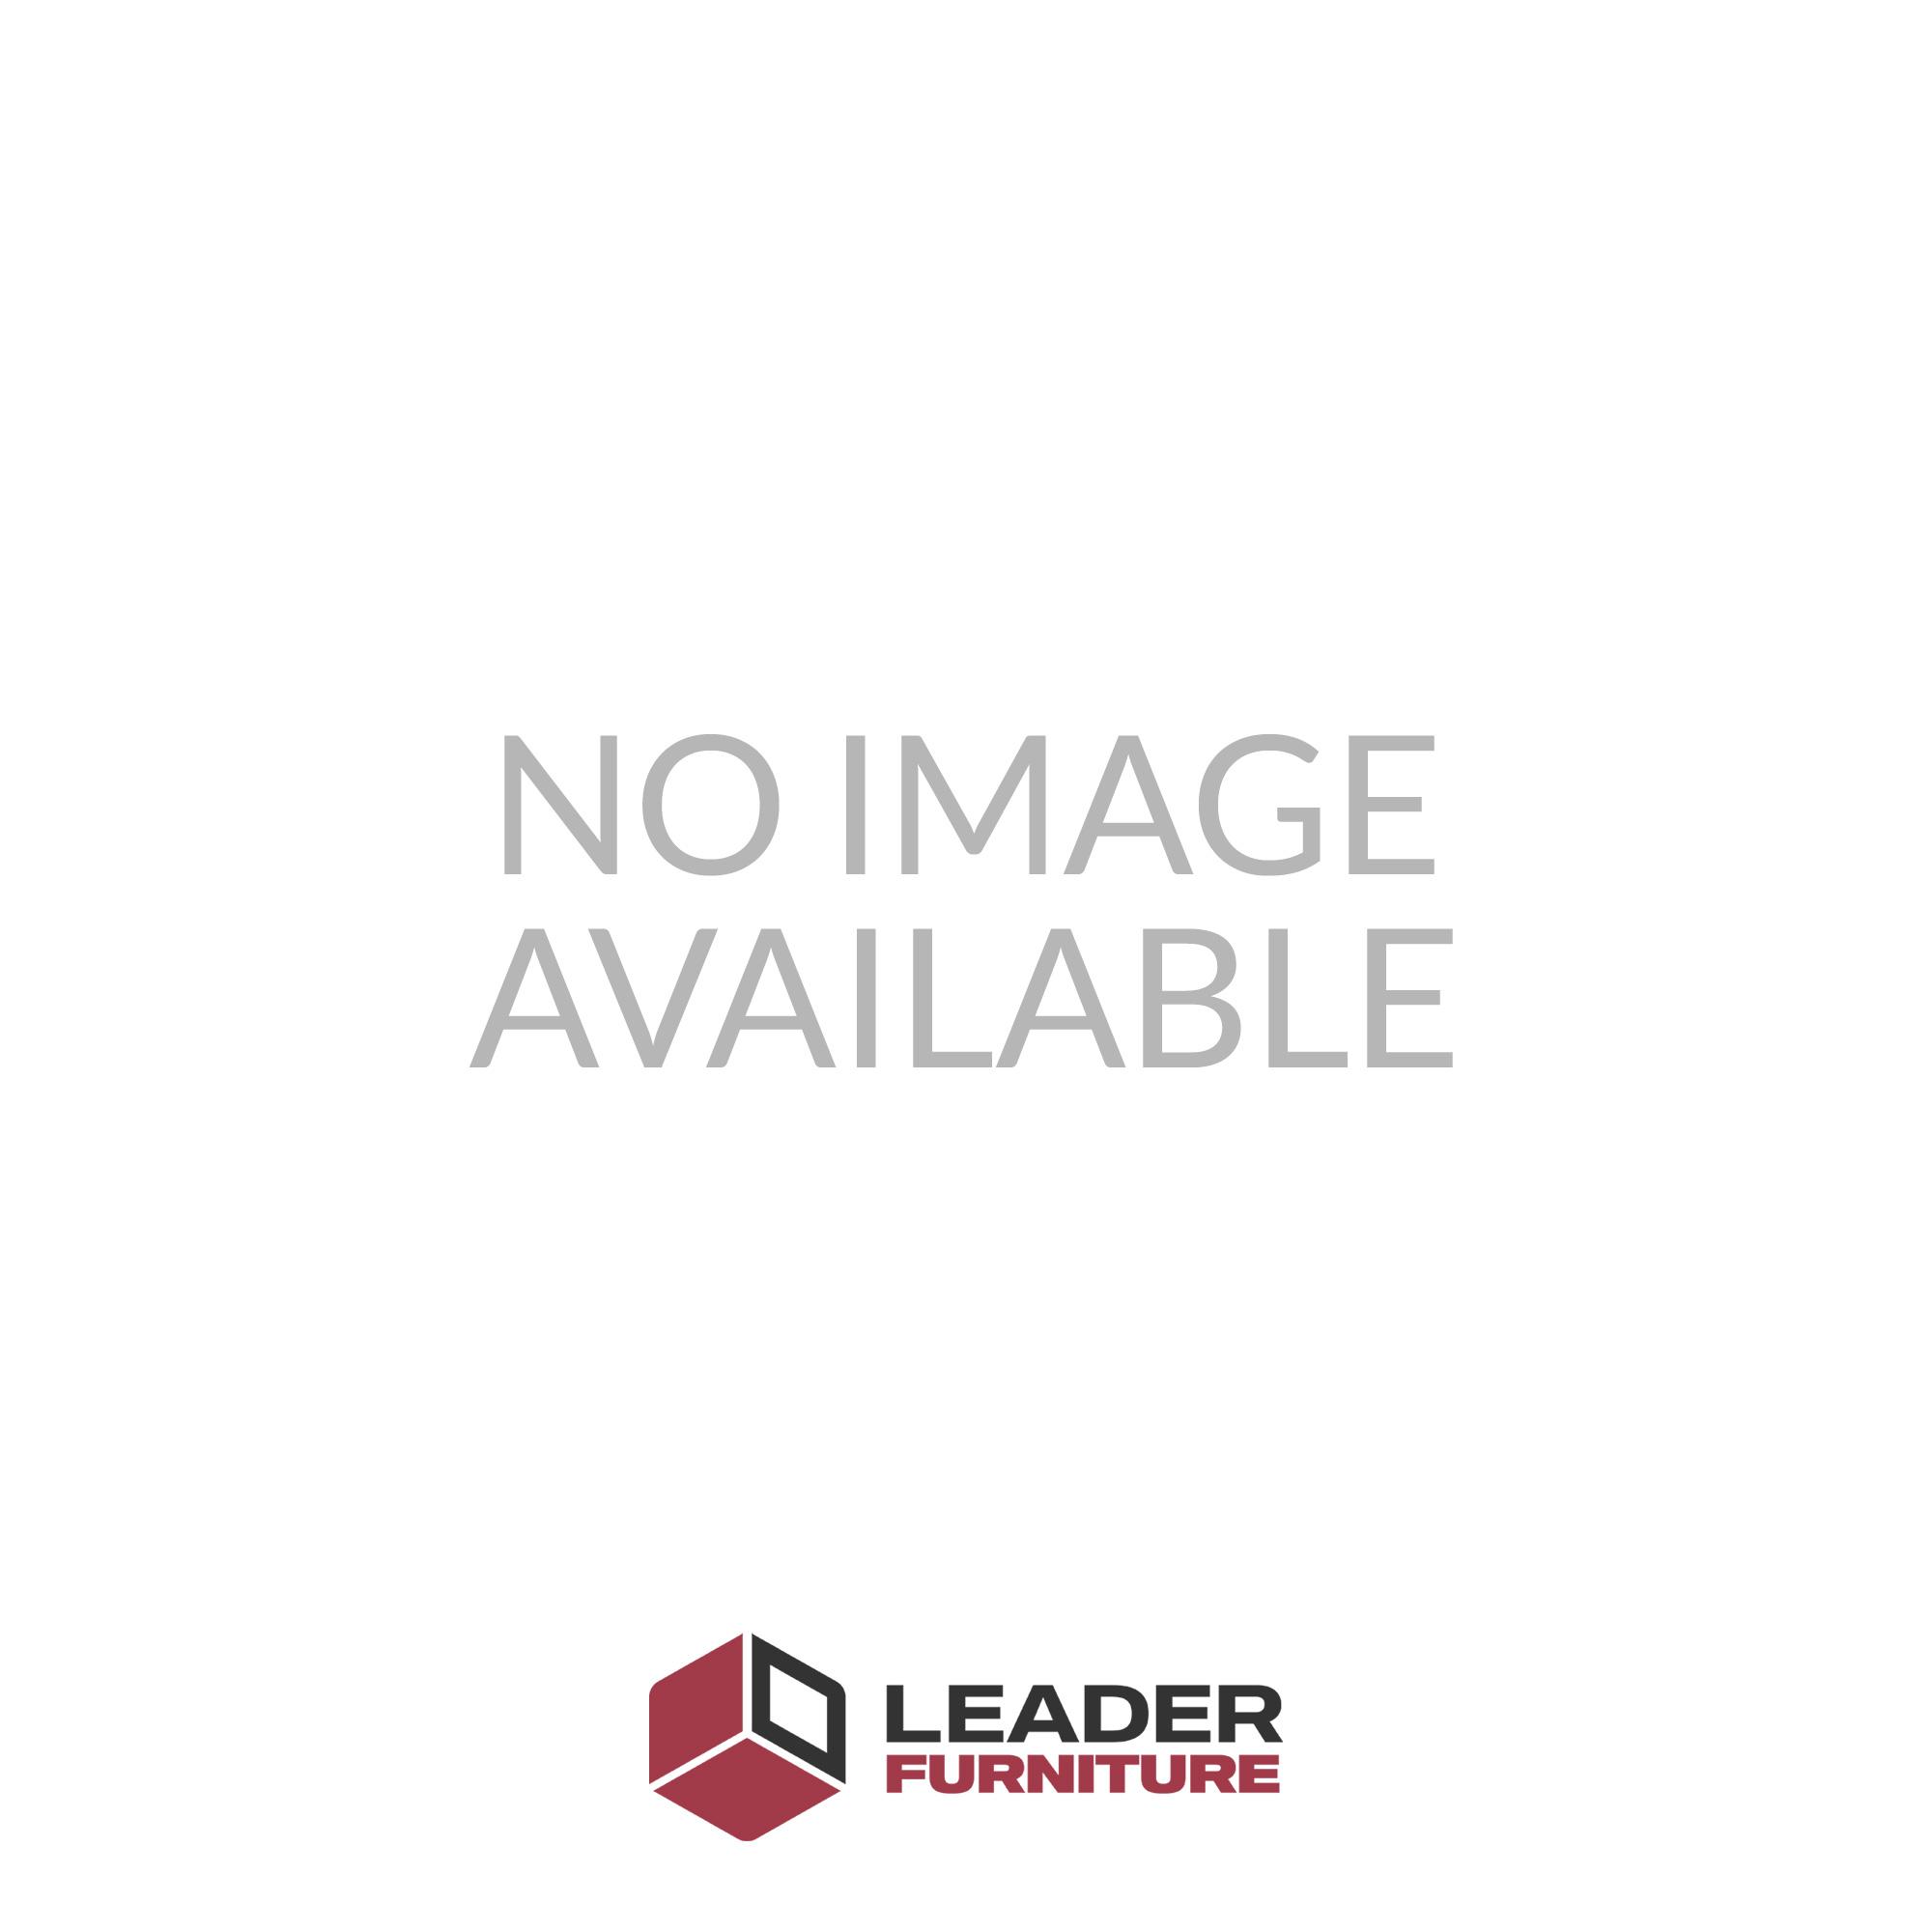 External Classical Octagonal Centre Polished Brass Door Knob on Rose